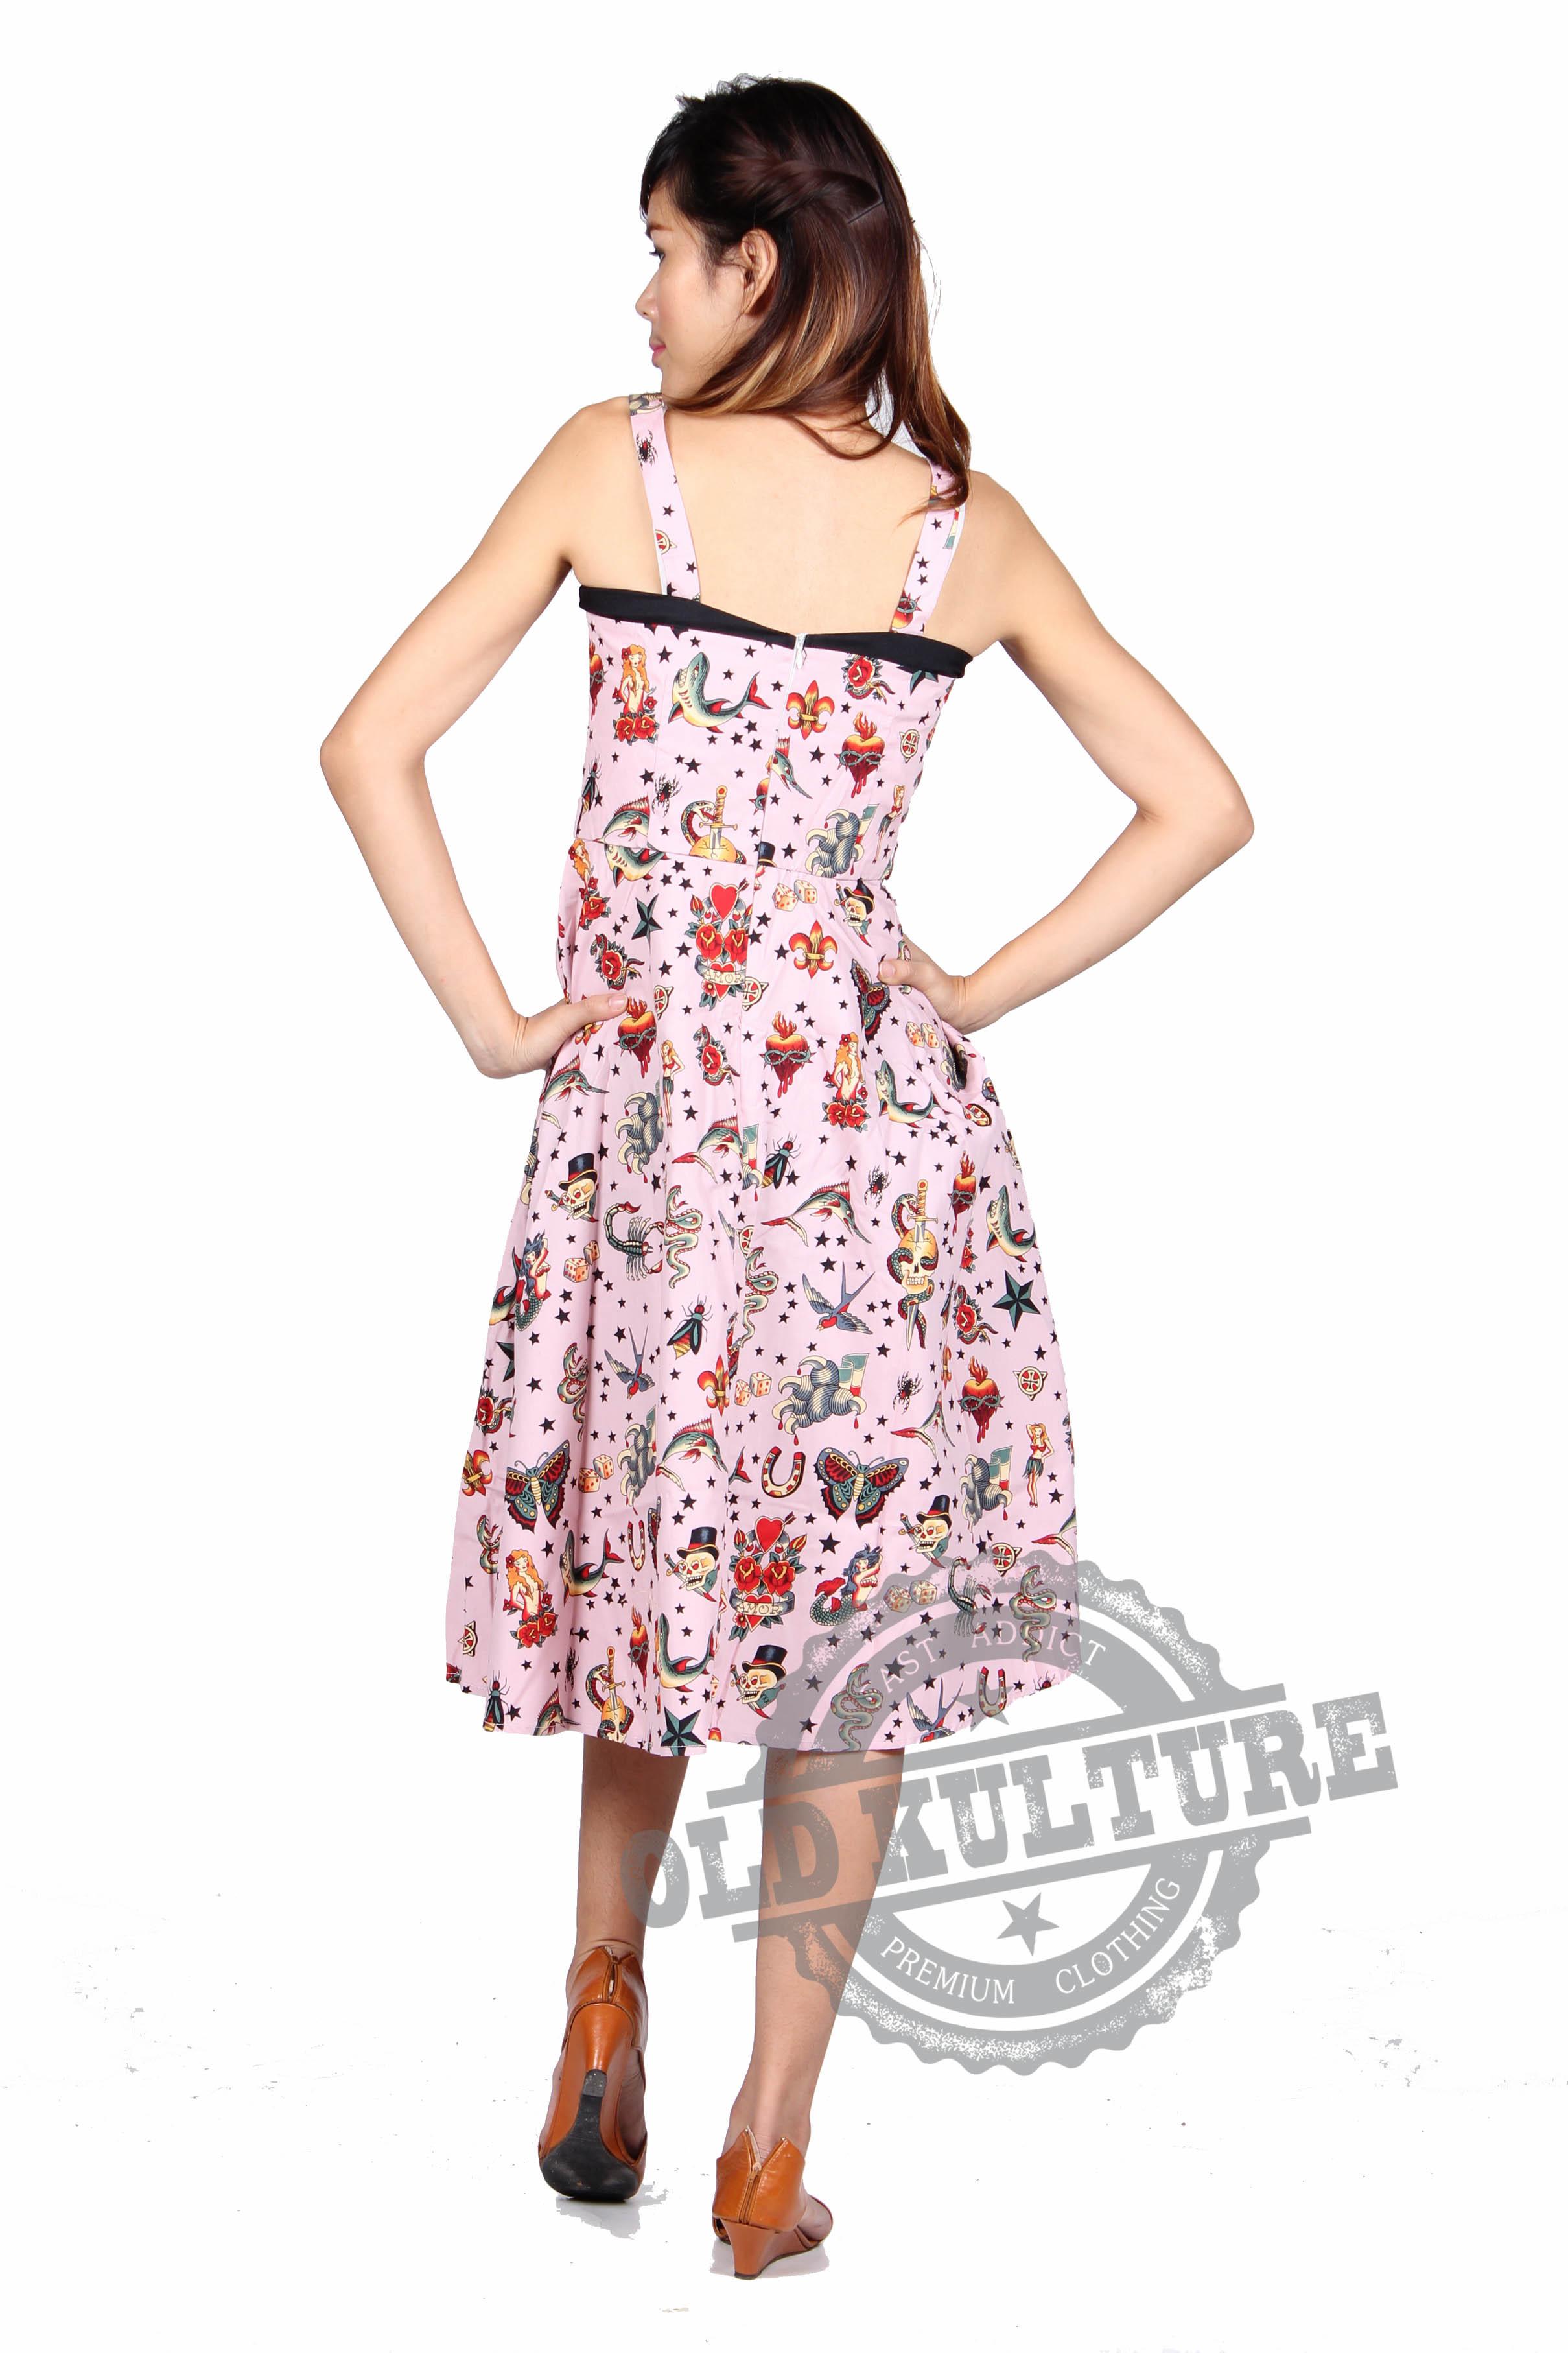 rockabilly_women_dress_skull_roses_retro_vintage_pin_up_cocktail_prom_party_unique_design_d17_dresses_3.JPG